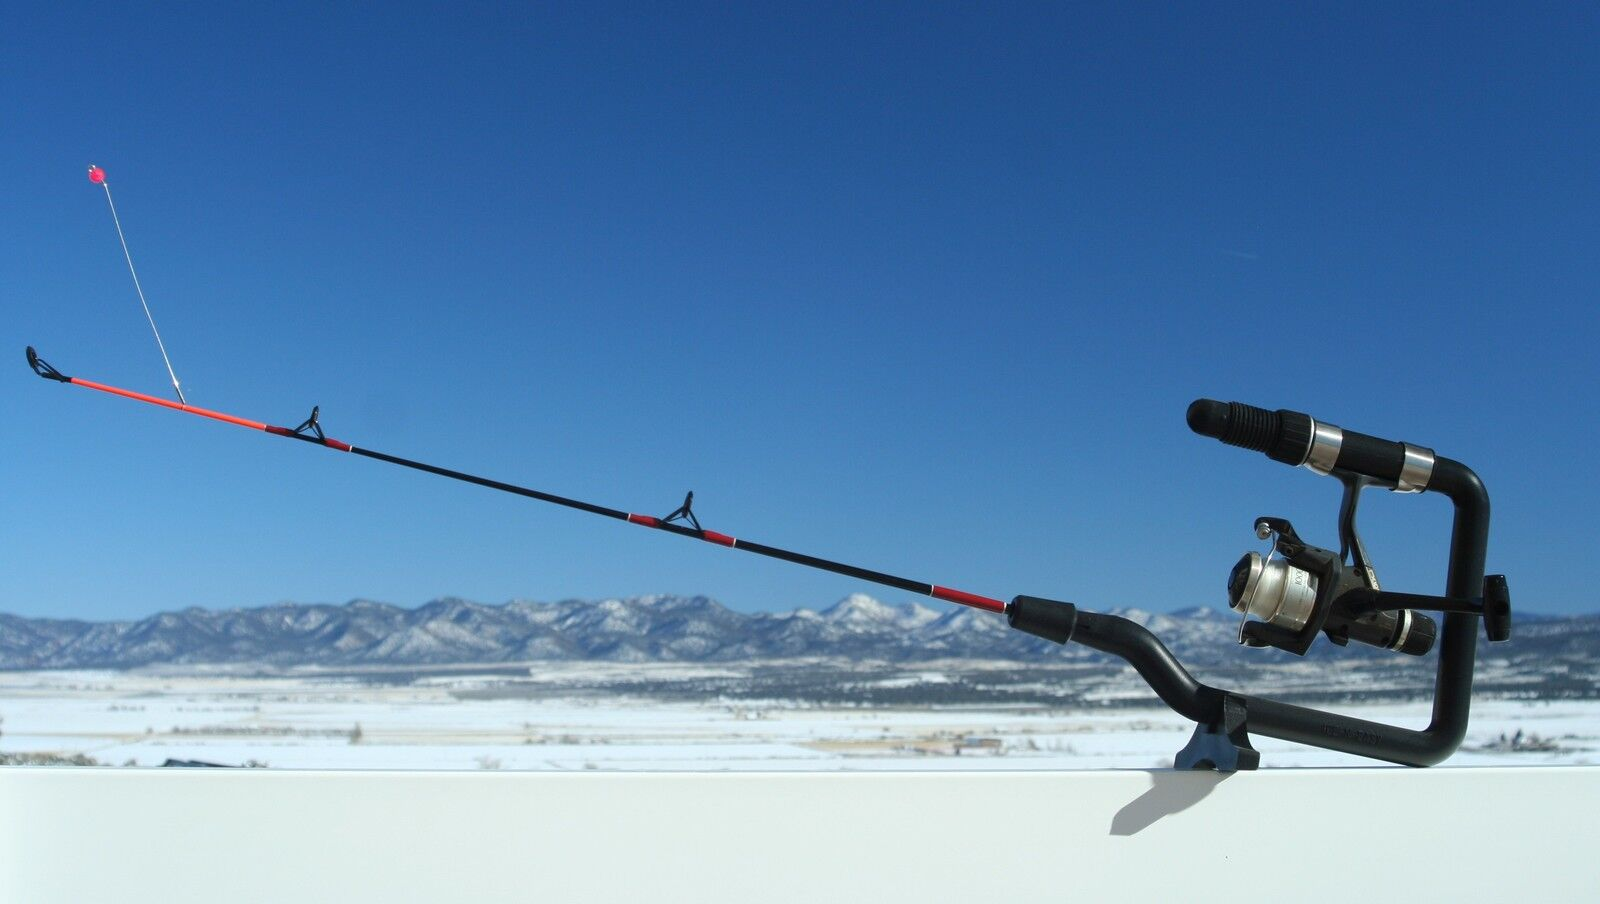 Ice n easy ice fishing rod 18 inch medium light action for Light action fishing rod